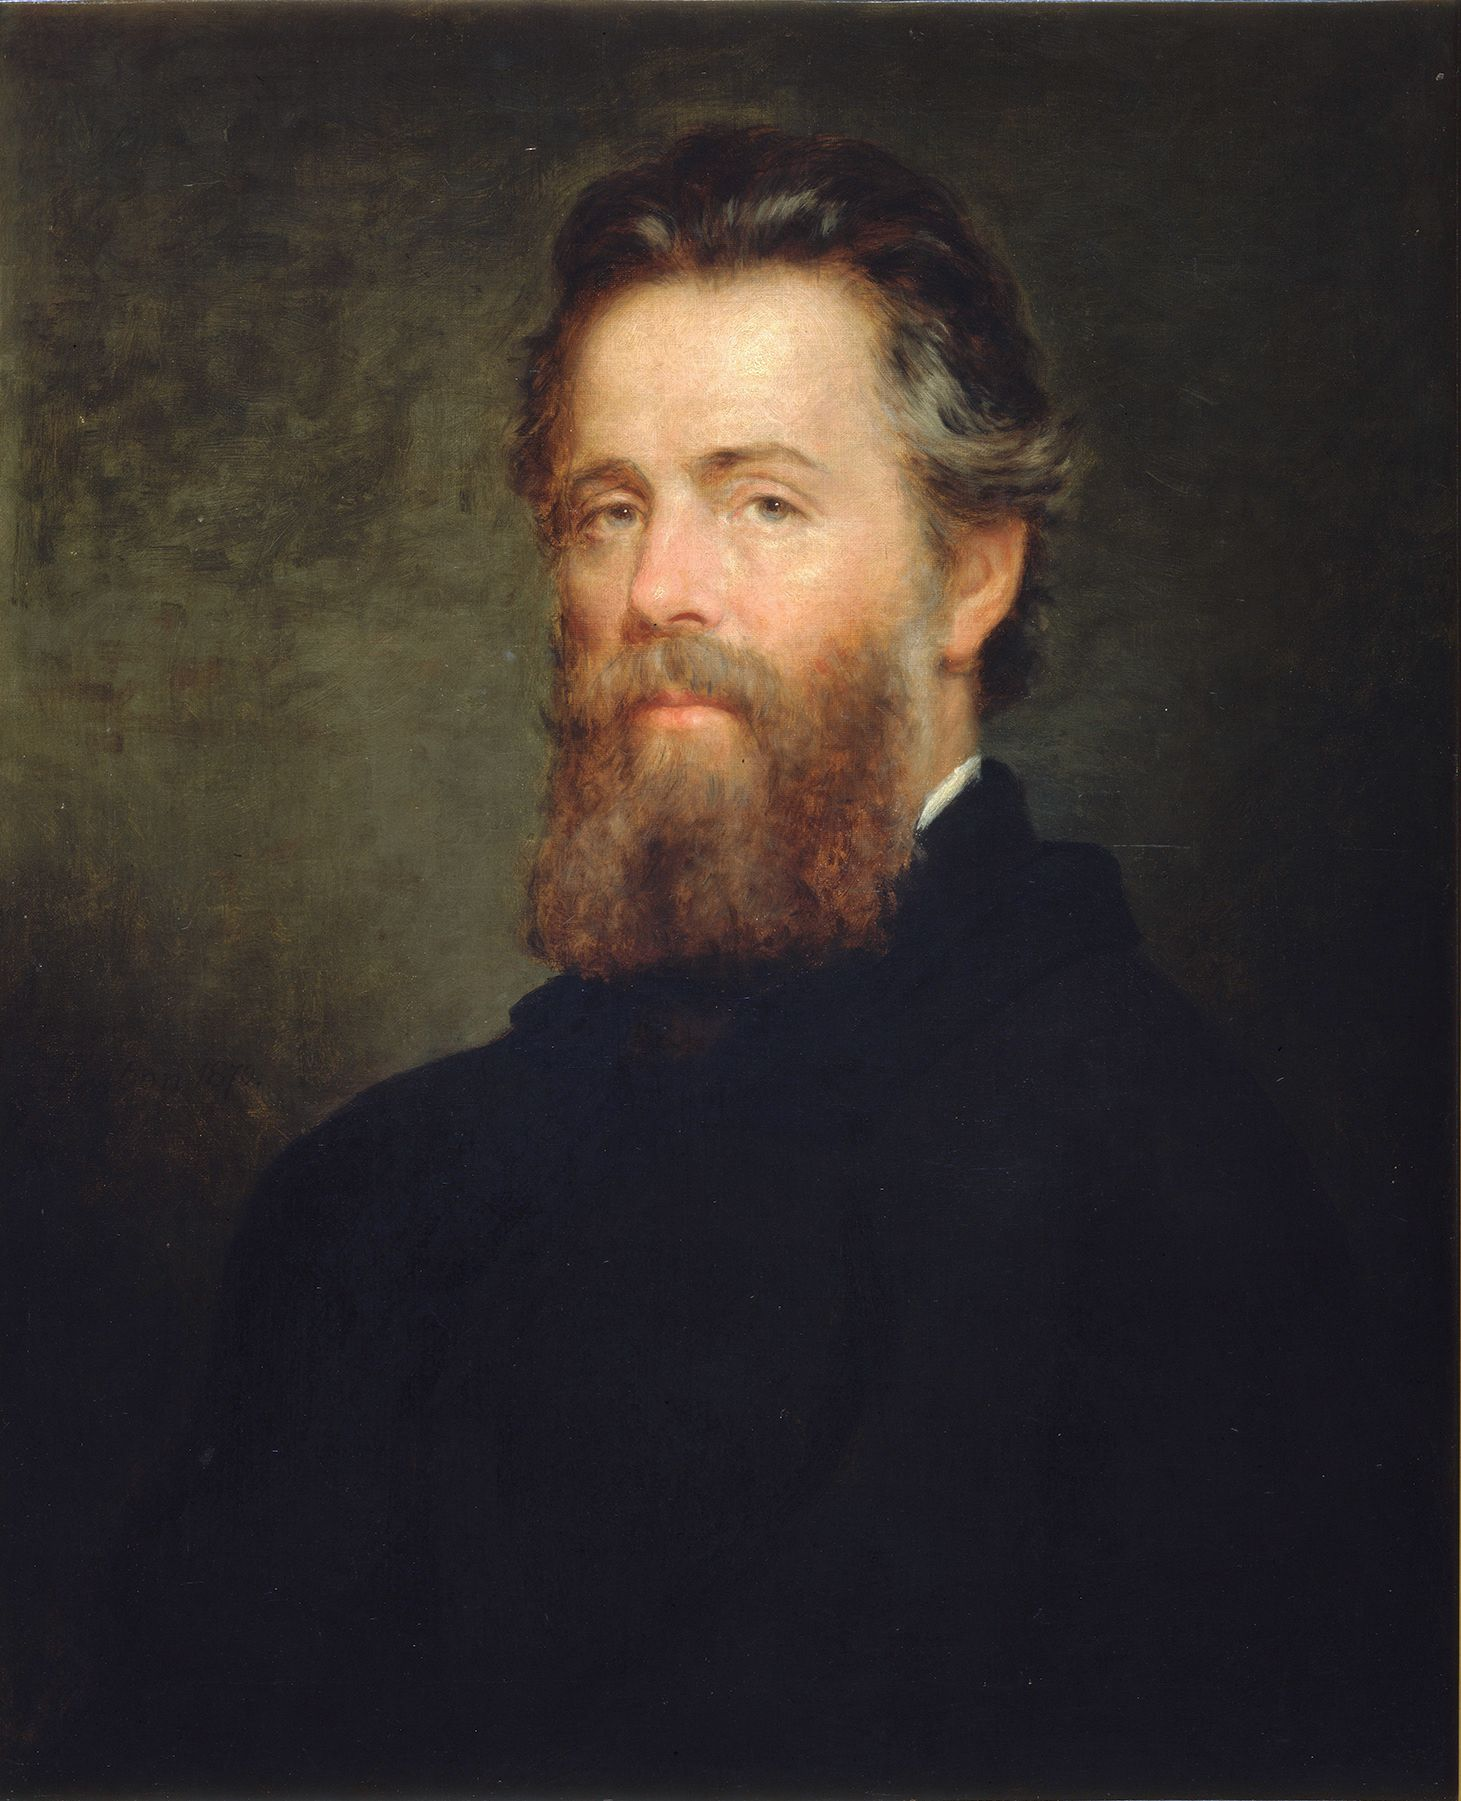 Herman_Melville_by_Joseph_O_Eaton